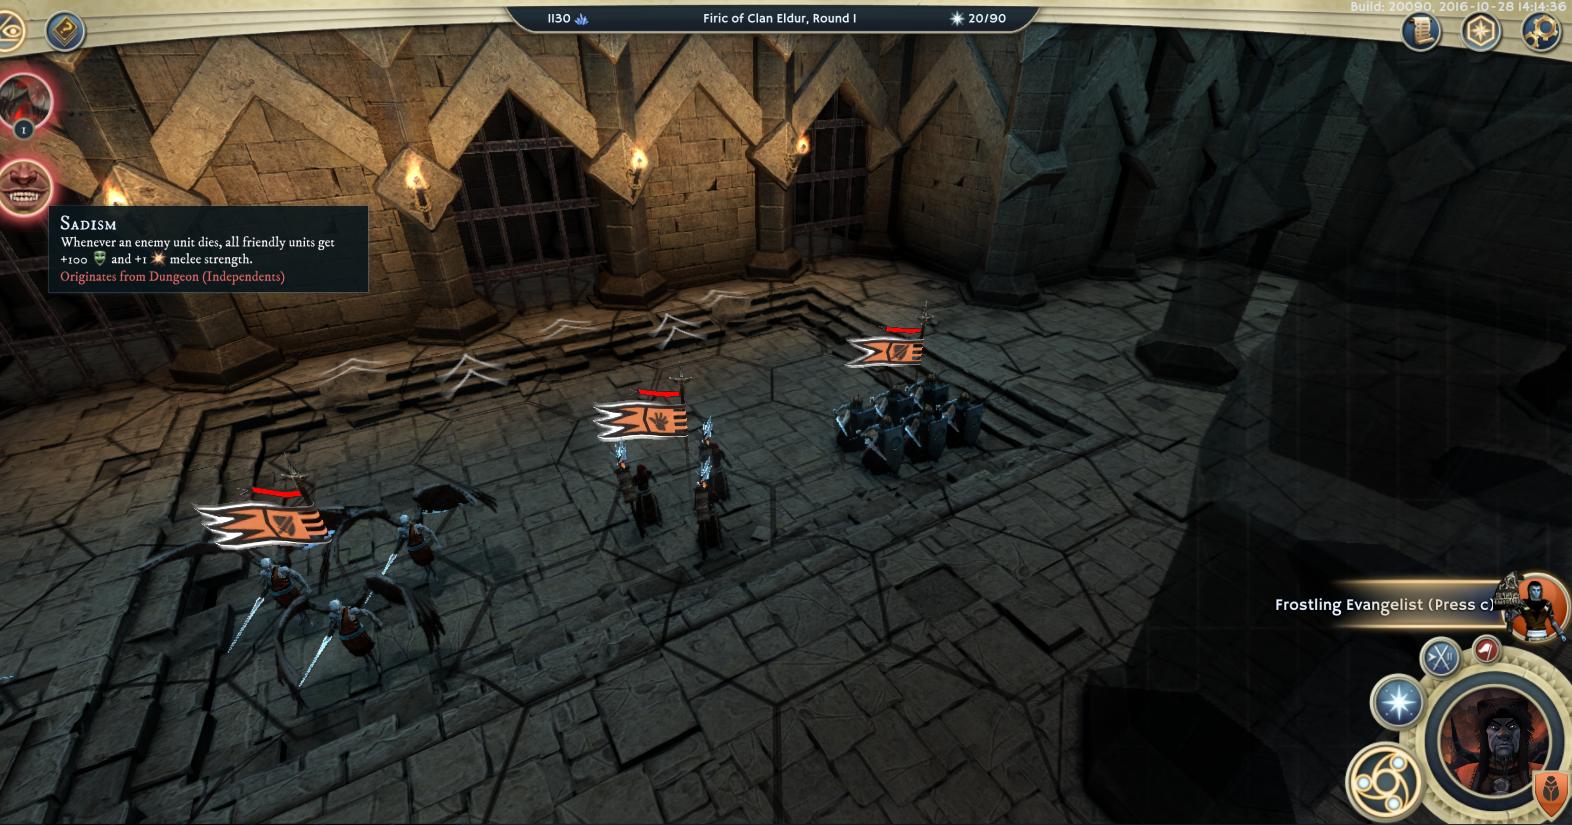 IMAGE(https://www.my-league.com/games/273/downloads/screens/47398/273/4739820170319_balance-mod_Dungeon-battle-enchantments.png)